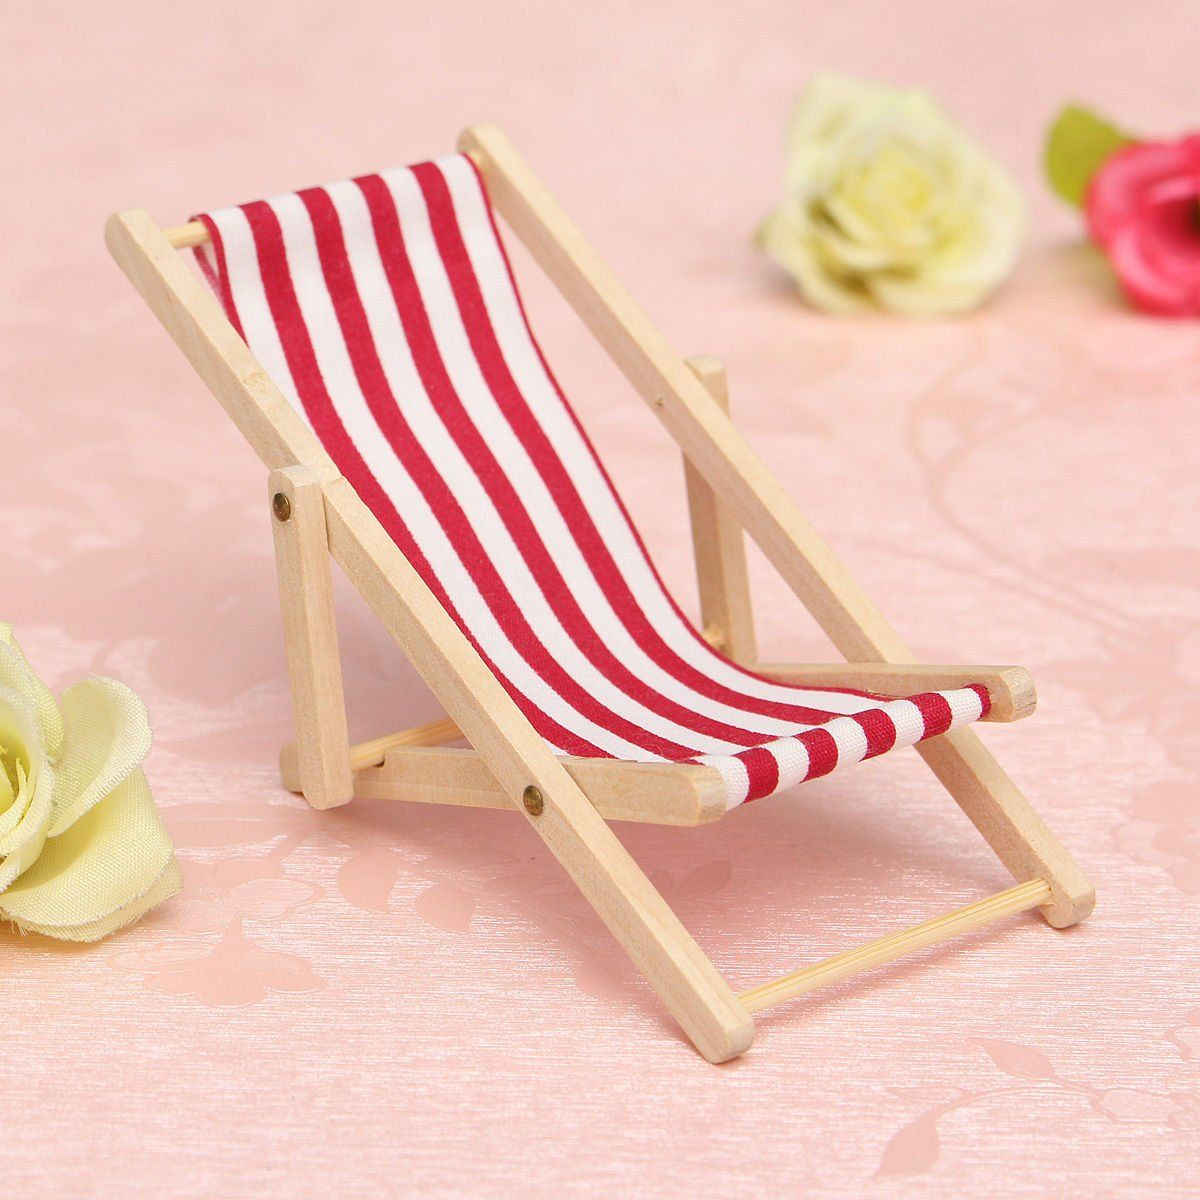 Pink+Dolls+House+1:12+Miniature+Foldable+Wooden+Deckchair+Lounge+Beach+Chair